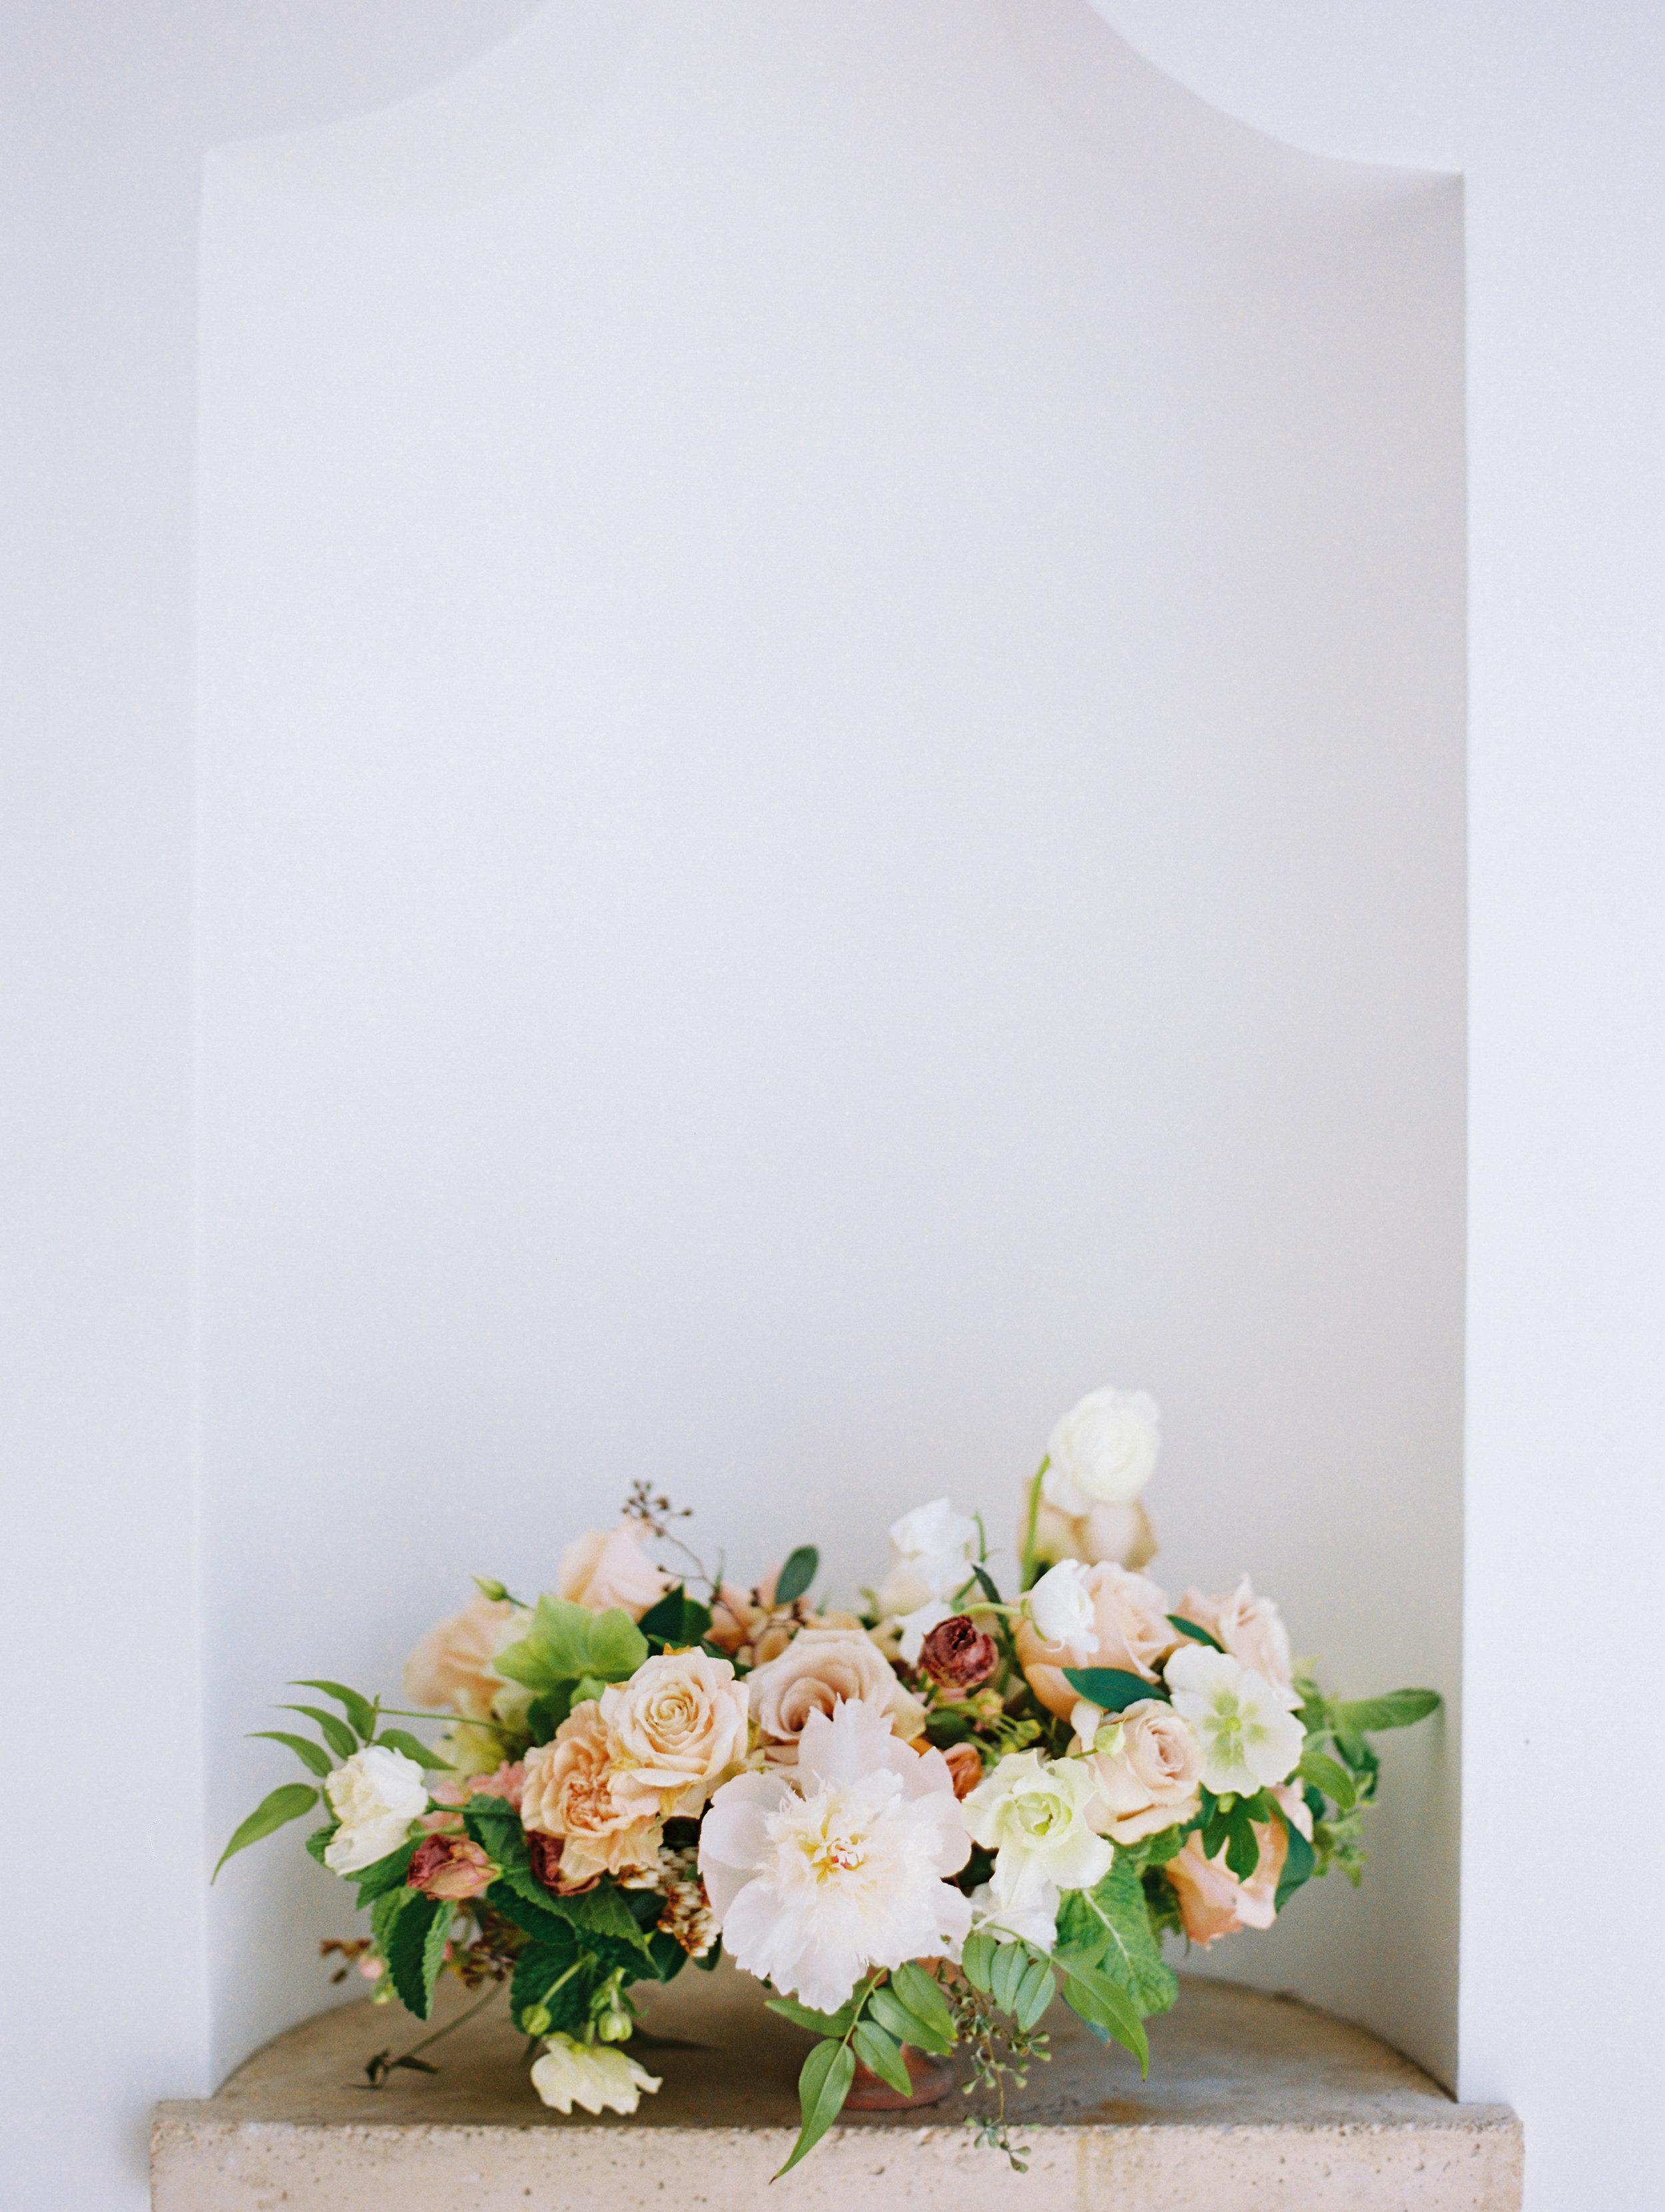 jessica-zimmerman-events-wedding-florida-intimate-floral.jpg